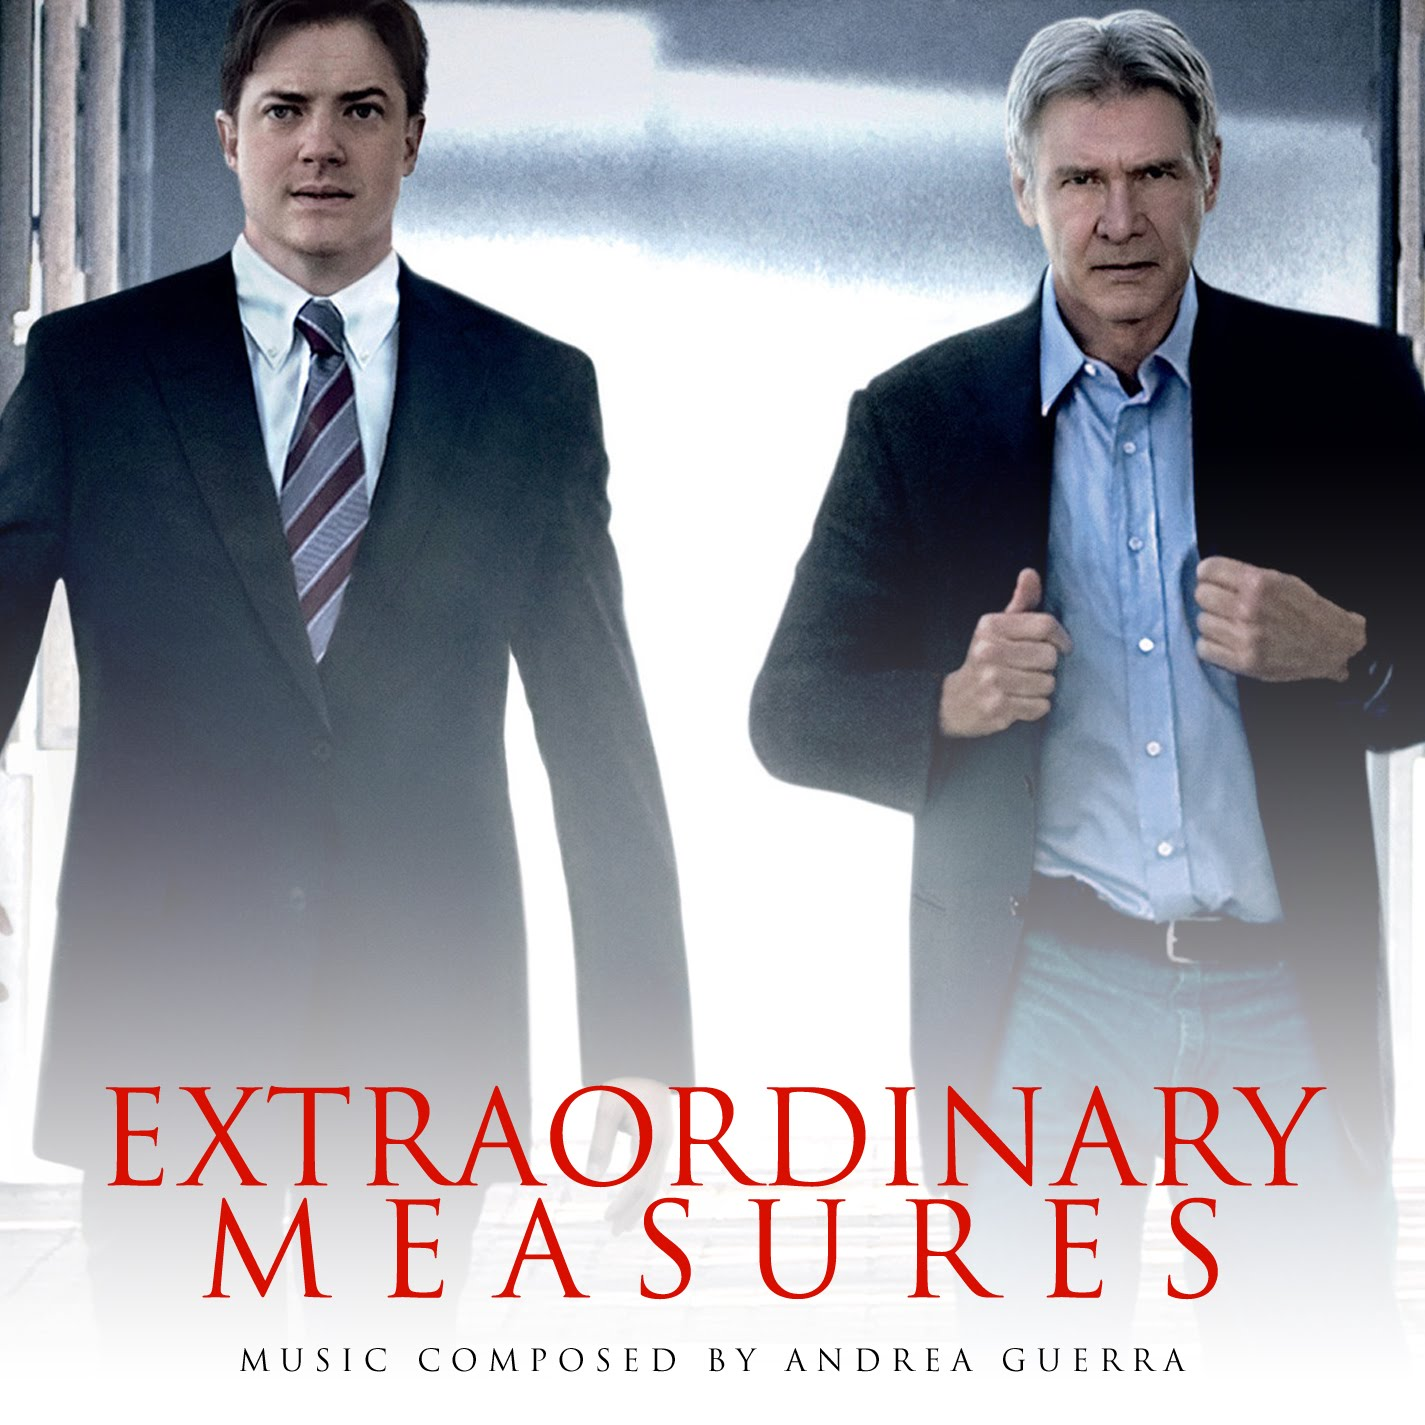 Extraordinary Measures Blu-ray